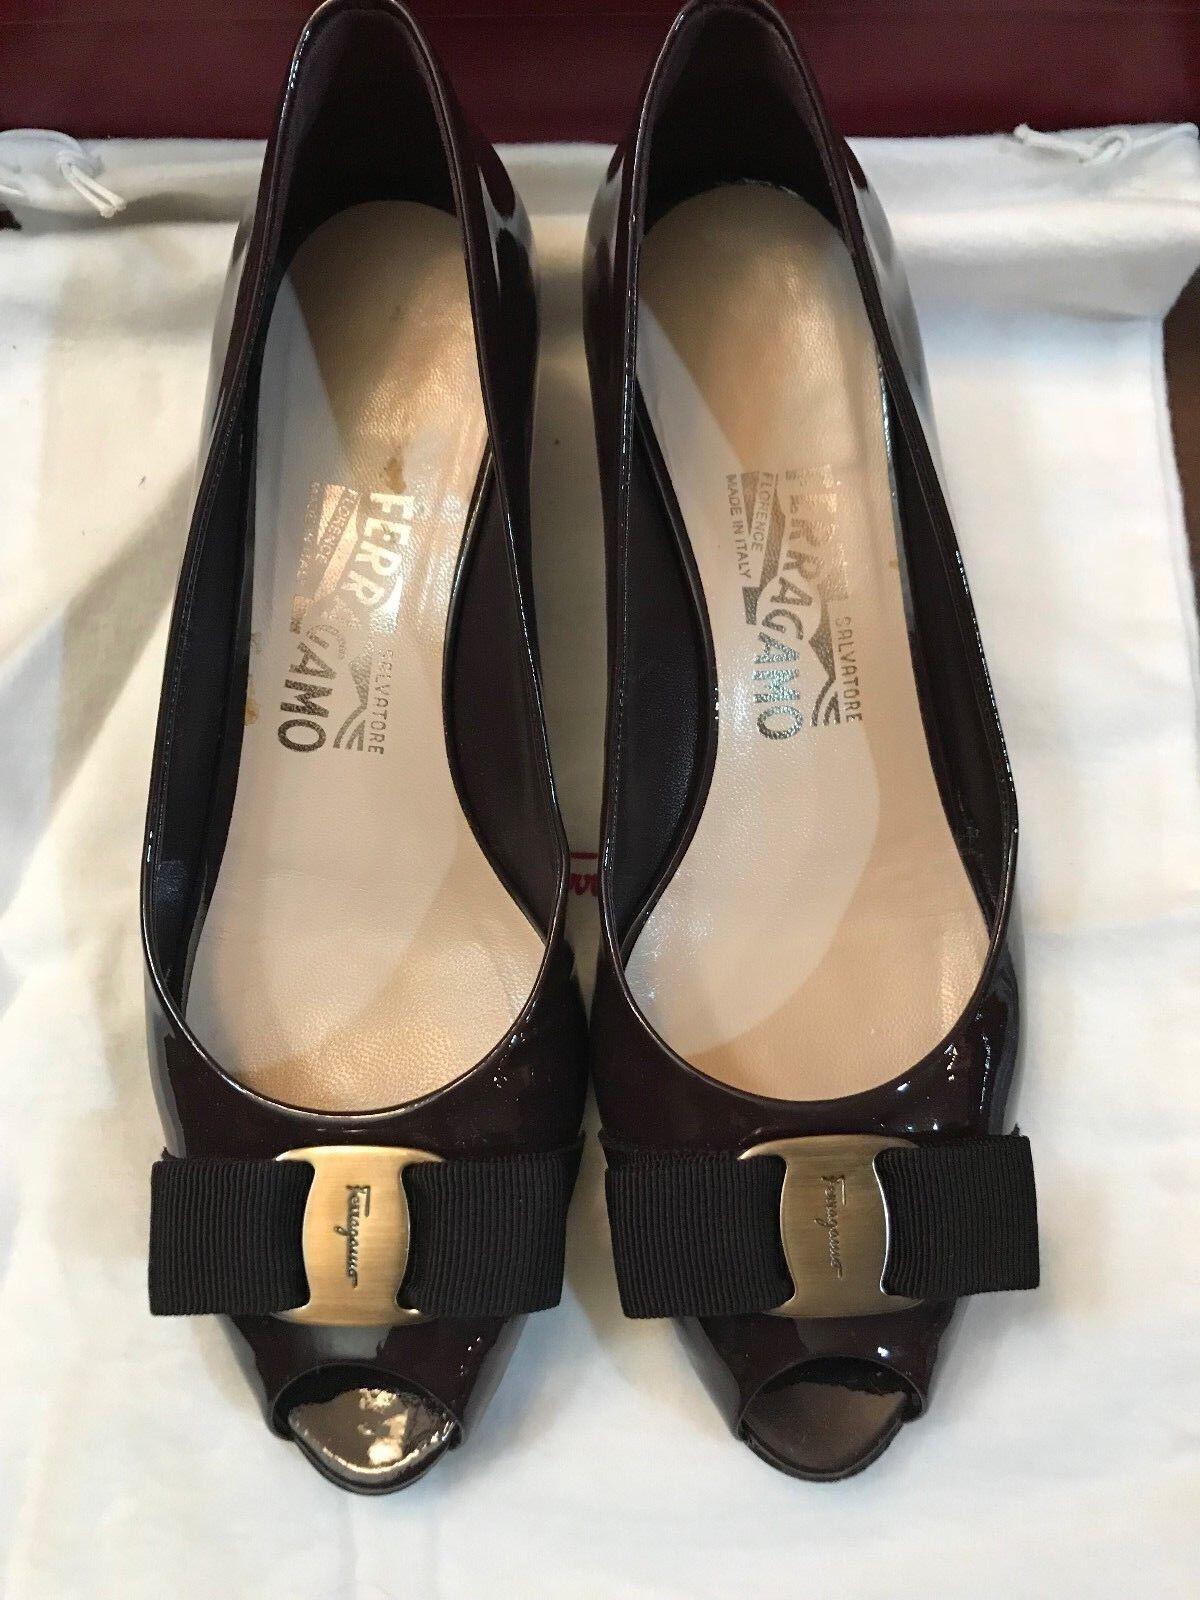 Salvatore ferragamo prune patten leather open toe pump size 7N